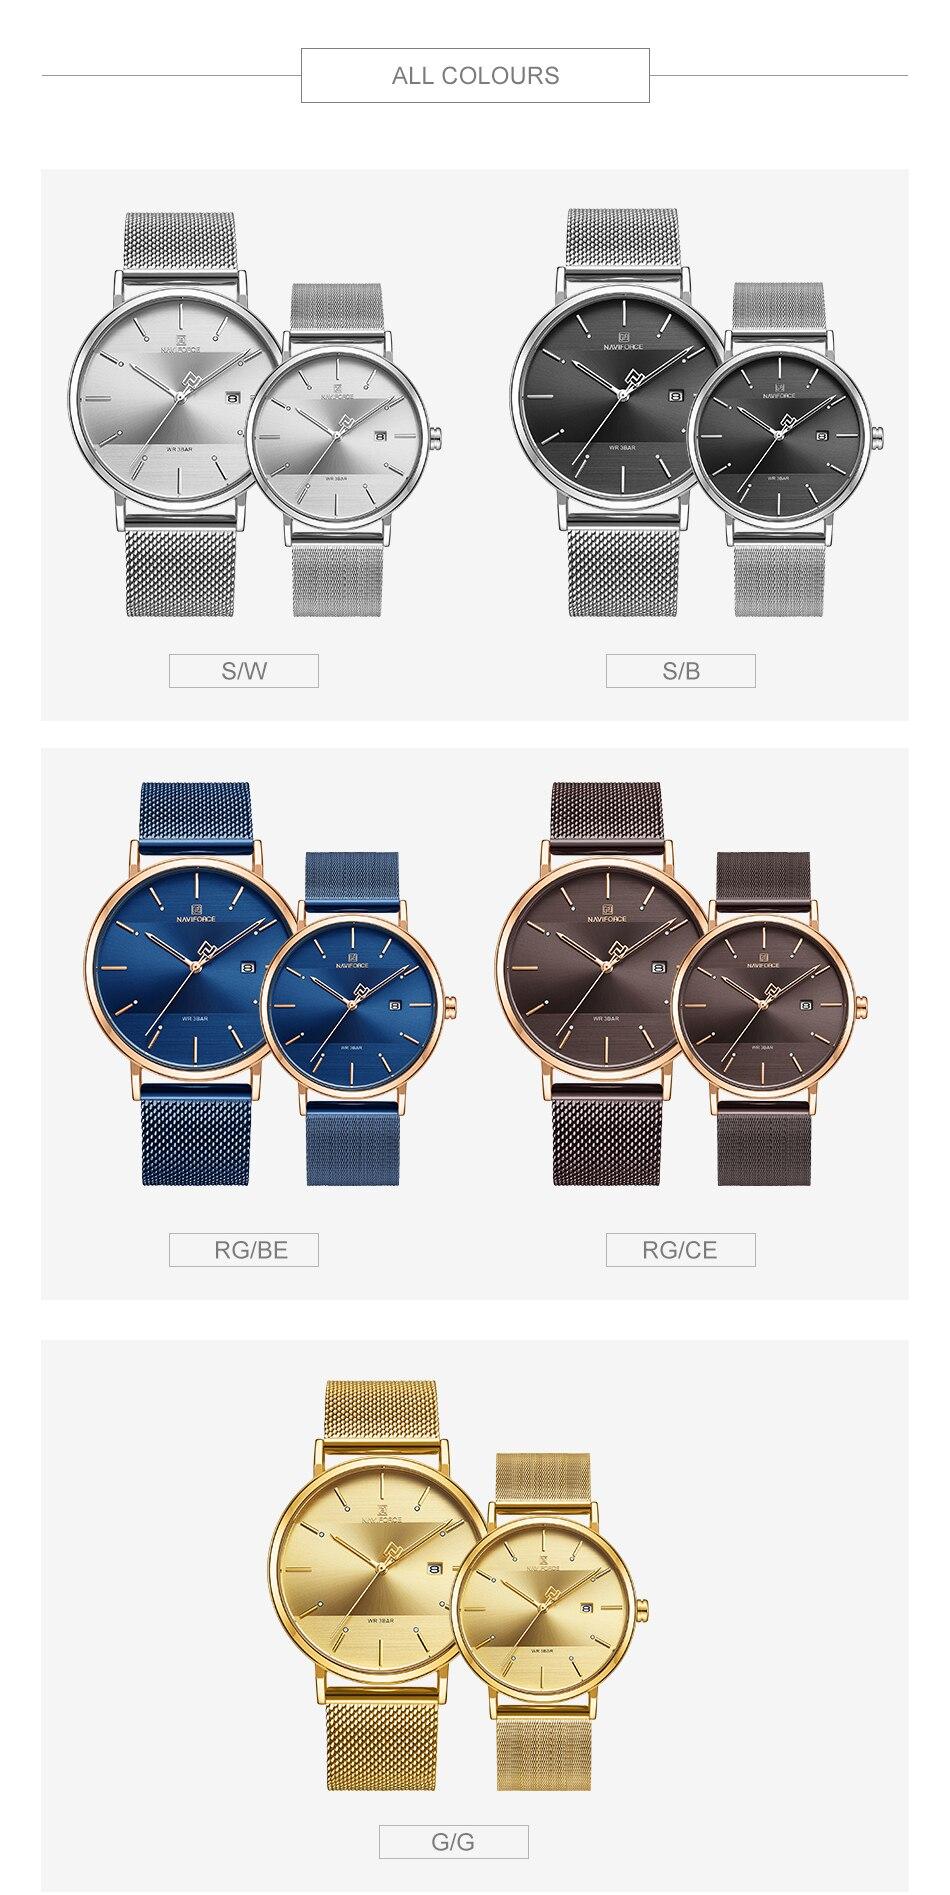 NAVIFORCE New Stylish Women Watches Top Brand Luxury Stainless Steel Strap Quartz Wristwatch For Woman Bracelet Watch 2019 Gift (13)